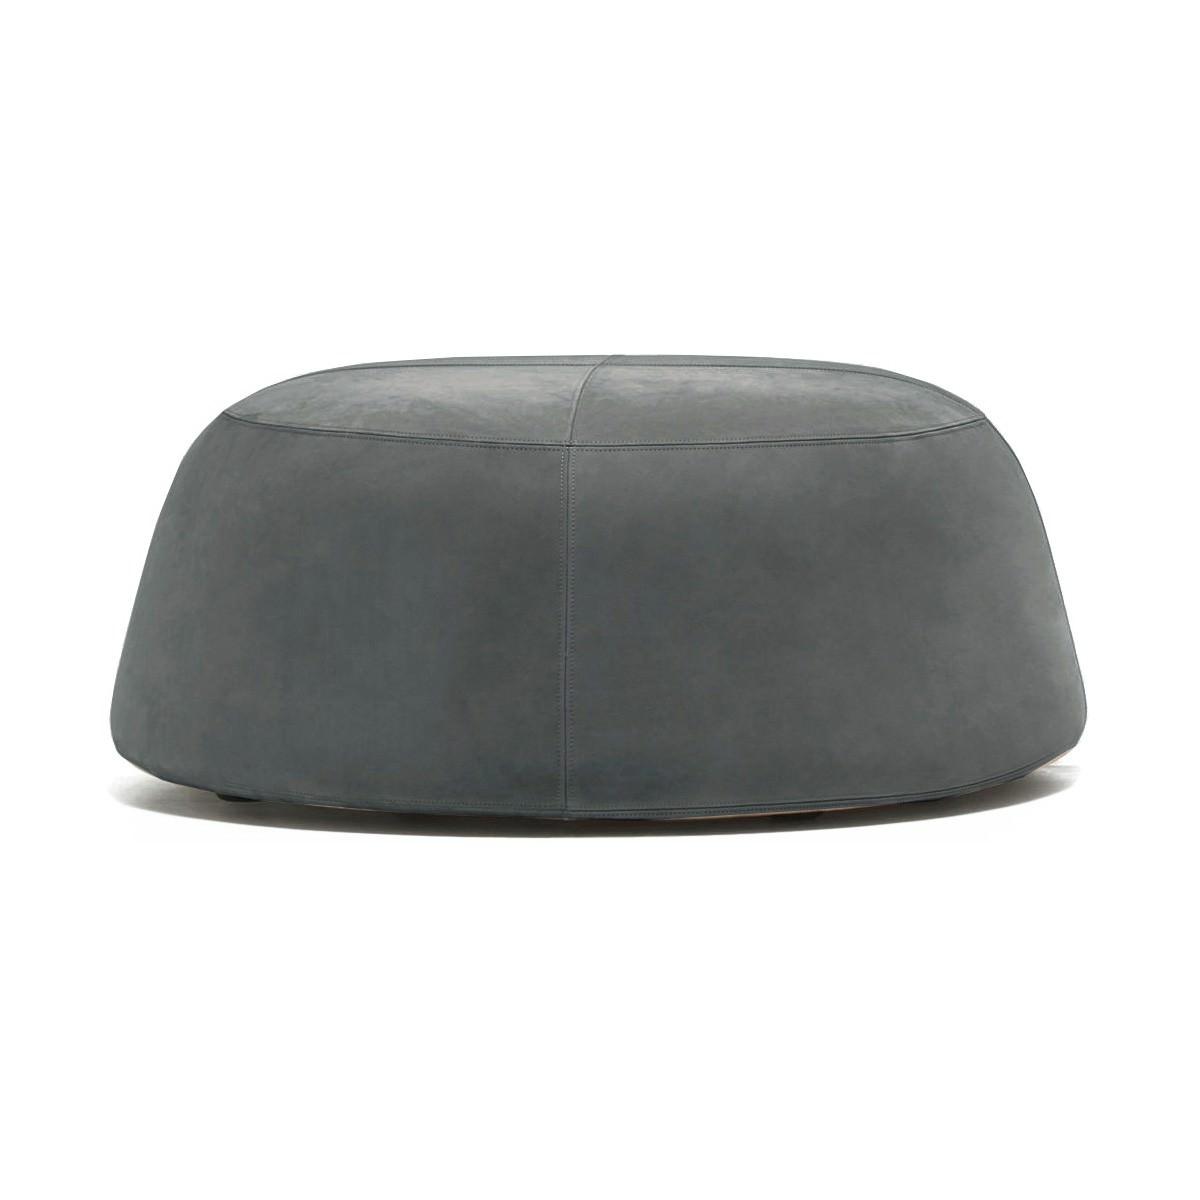 Pippa Velvet Fabric Round Ottoman, Large, Grey